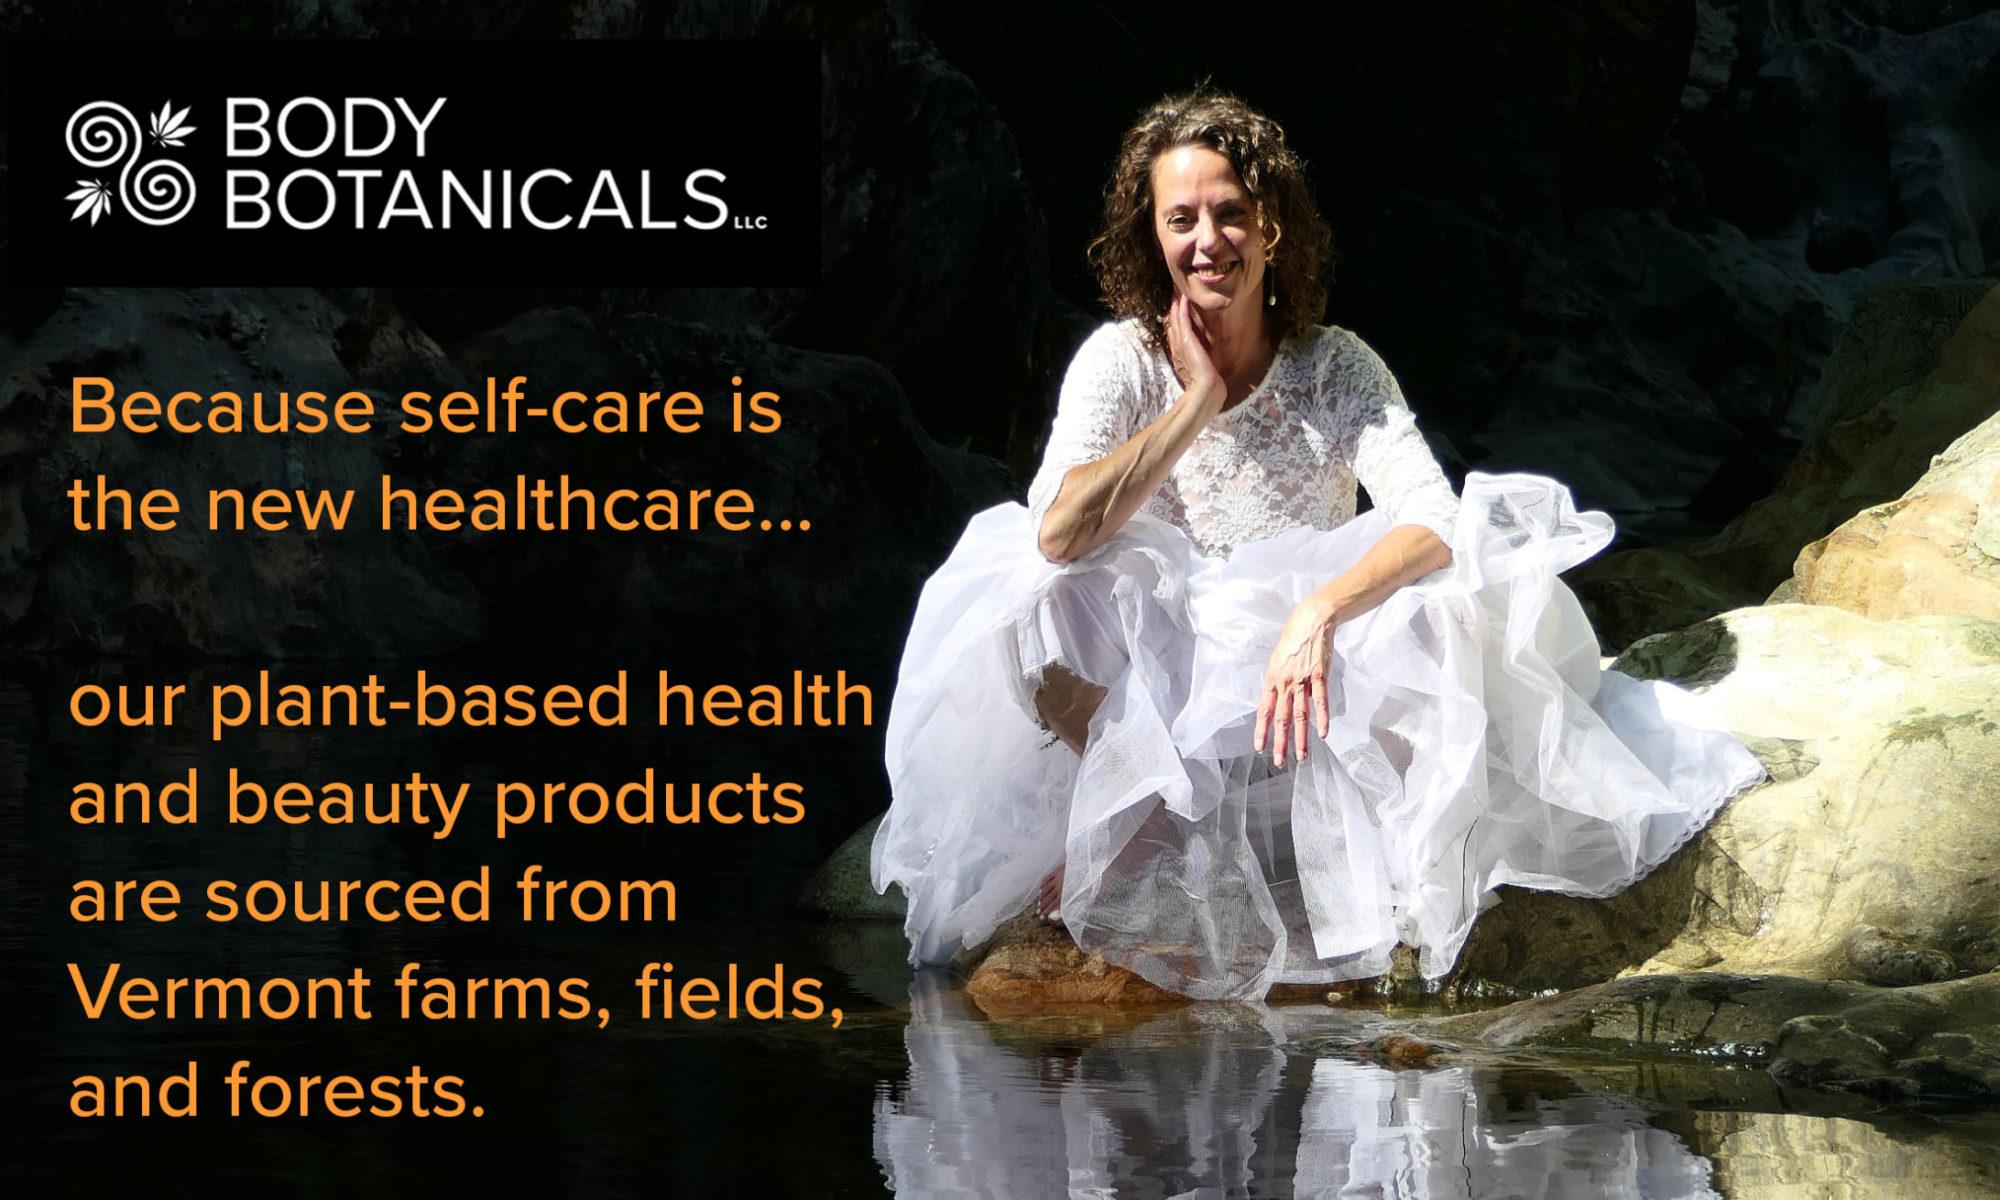 Body Botanicals, LLC